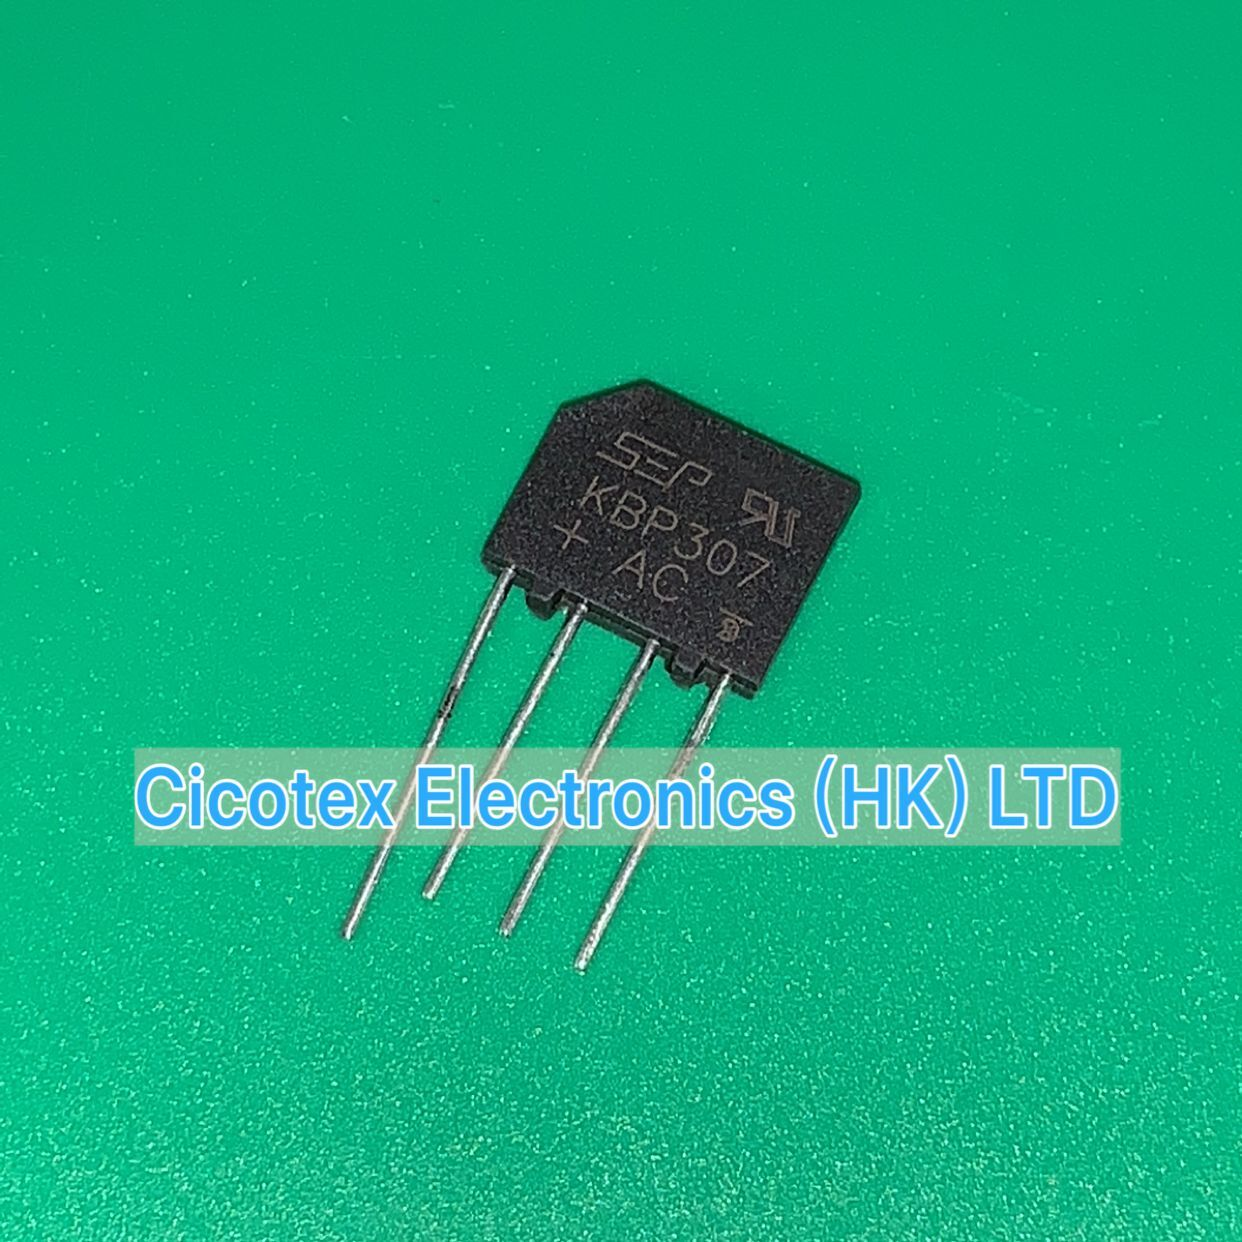 10 unids/lote KBP307 KBP4 KBP 307 DIP4 rango de tensión de 50 a 1000 voltios, 3,0 amperios KBP307G